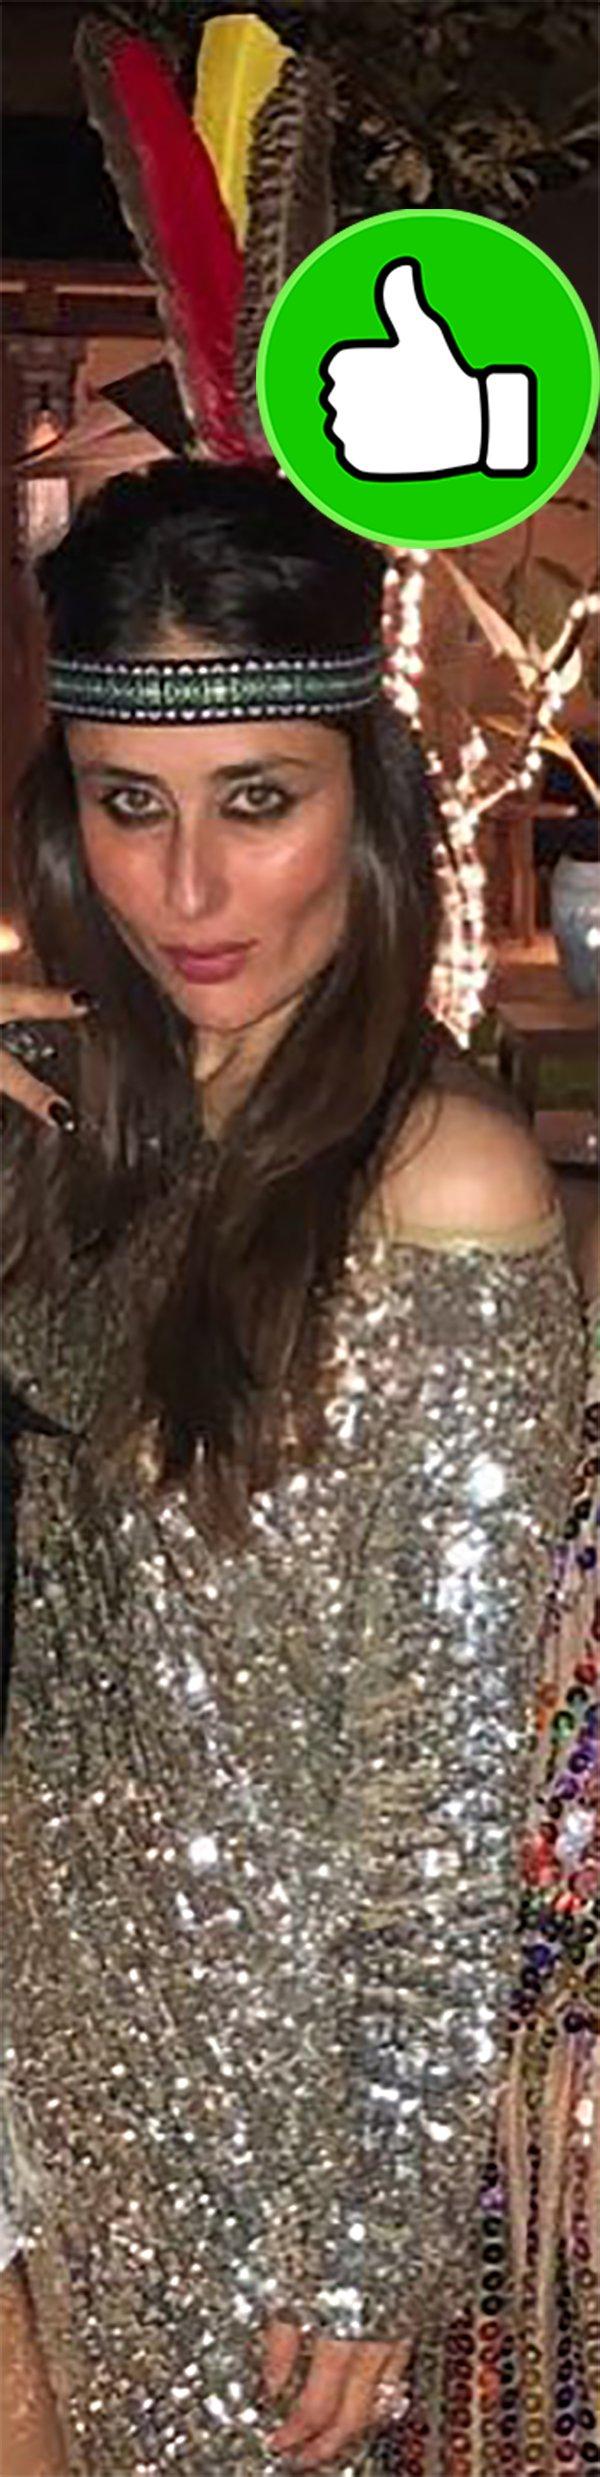 kareena kapoor looks too hot